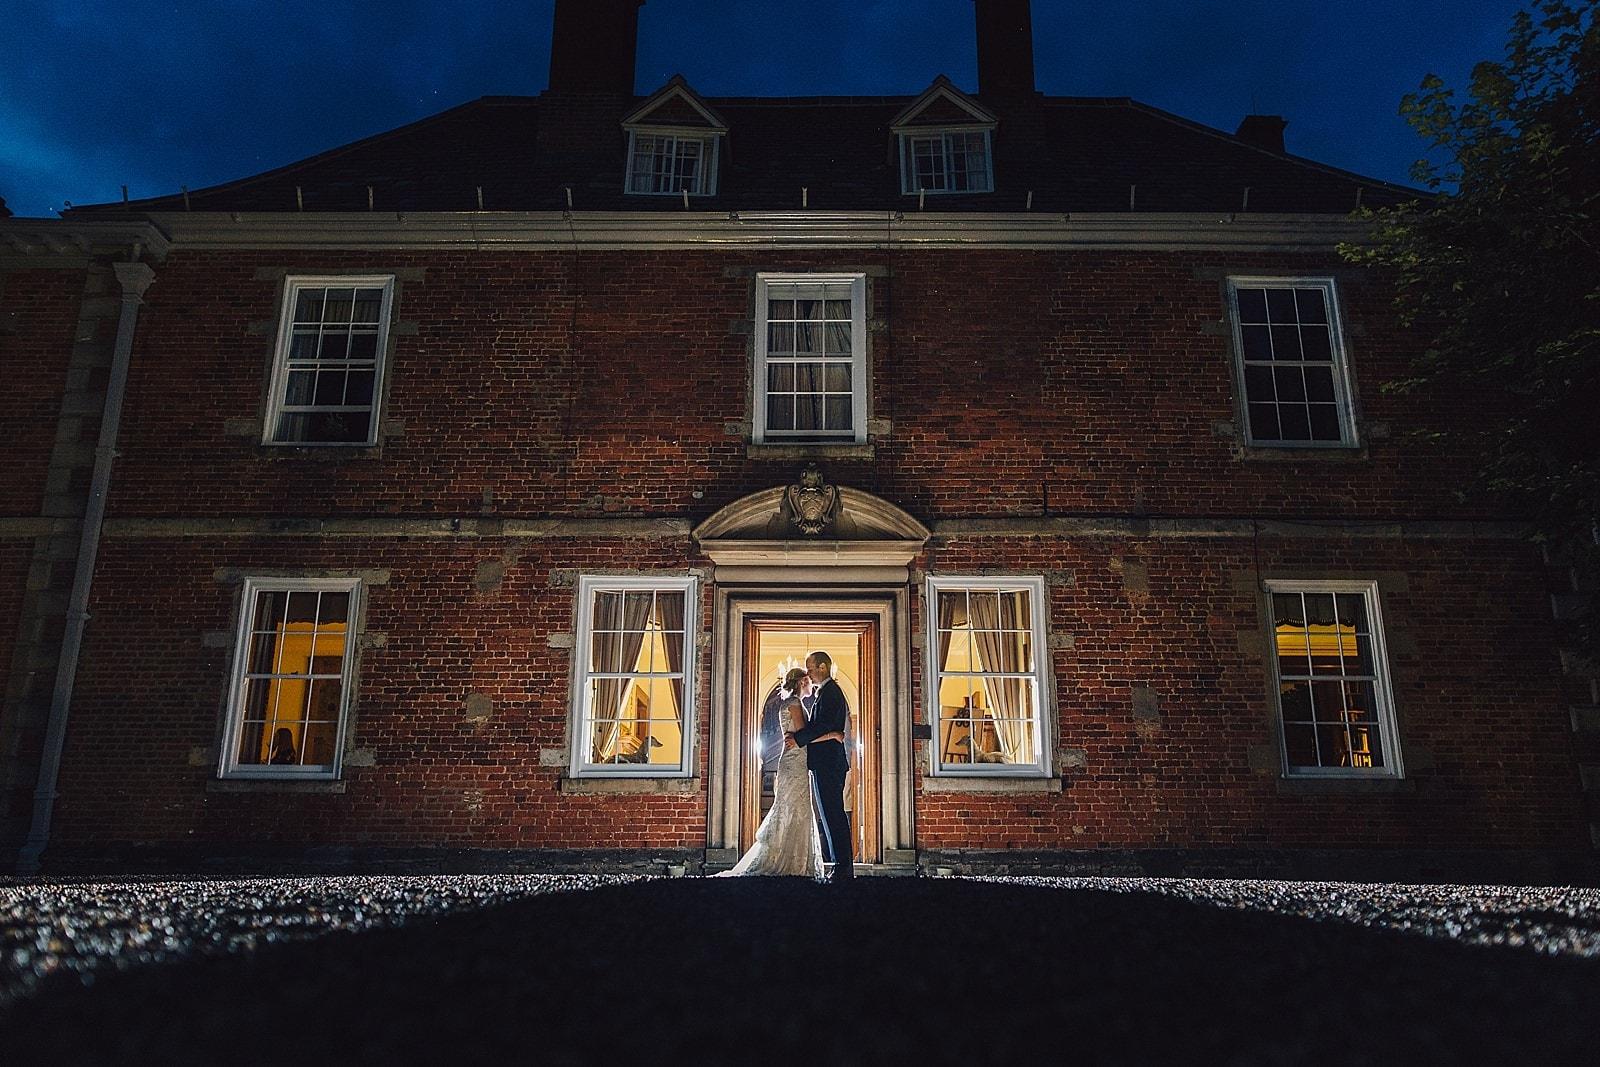 sutton-bonington-hall-wedding-photography_0108